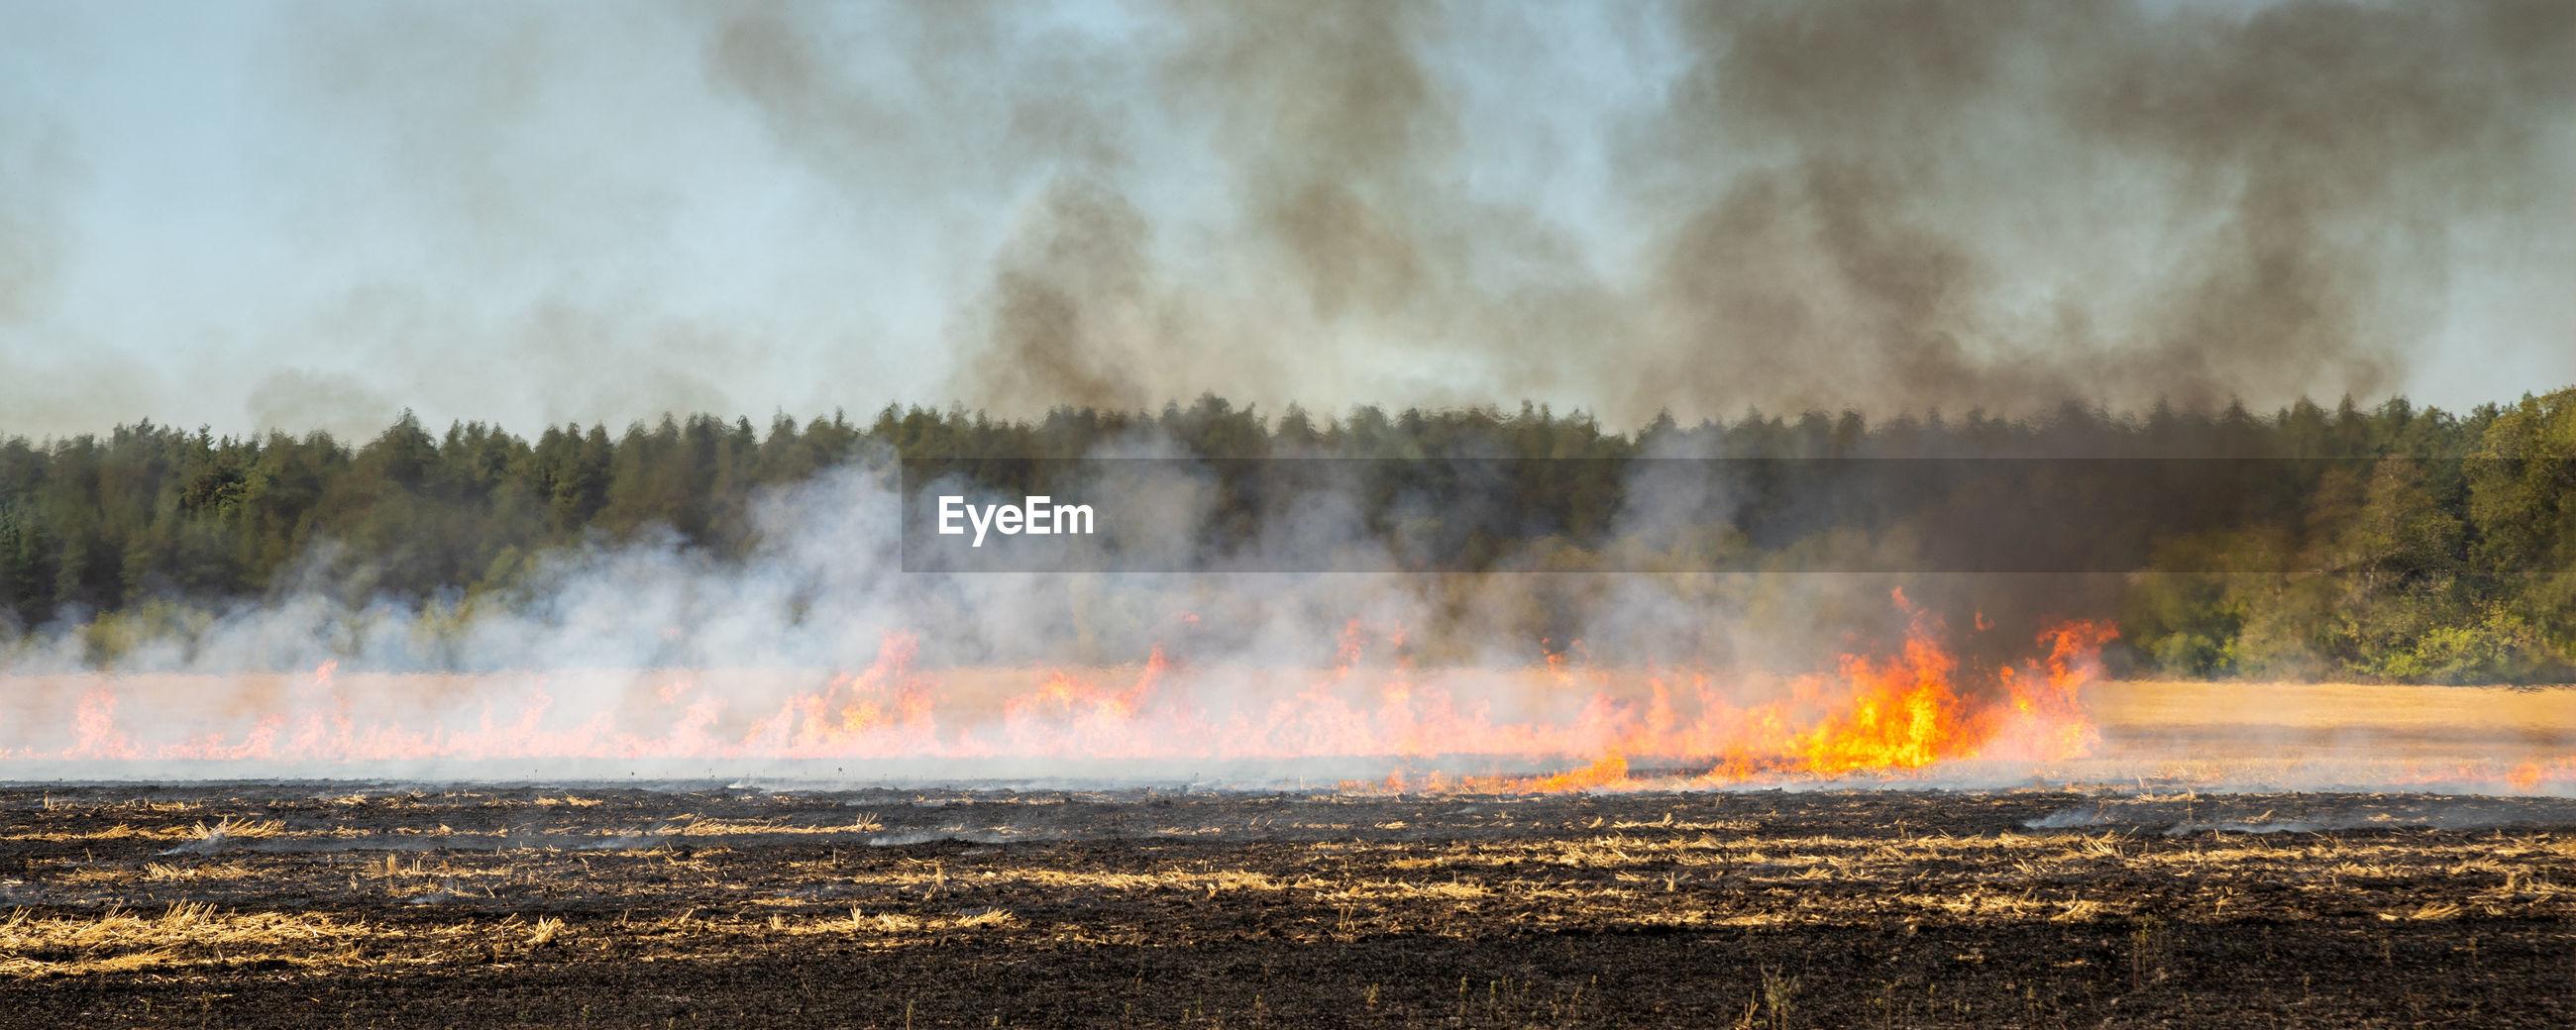 PANORAMIC SHOT OF BONFIRE ON FIELD